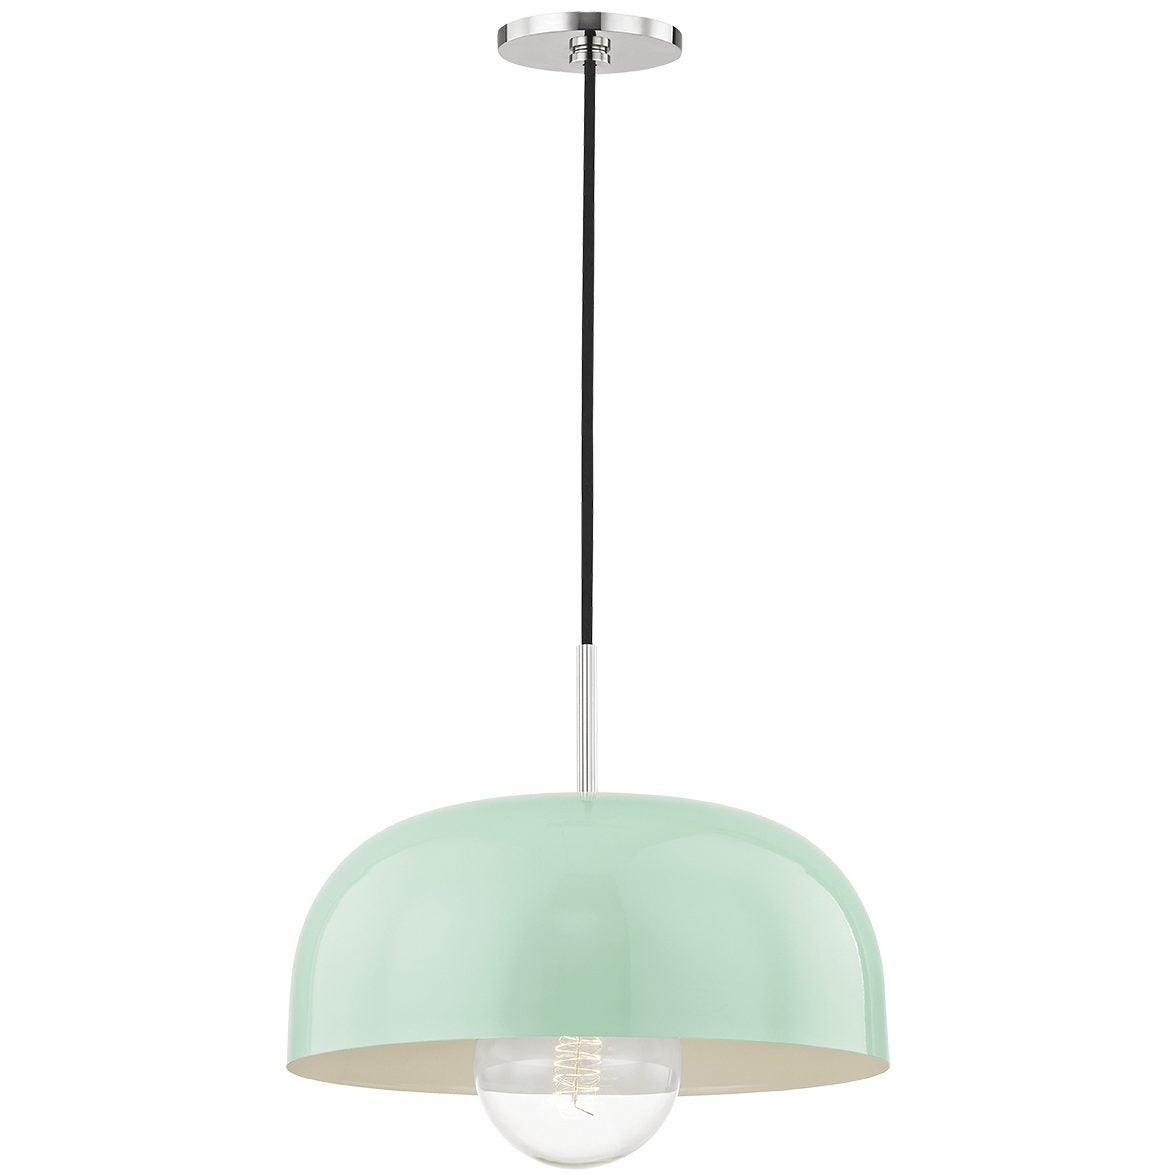 DM1220_EDPICKS_KB_LAMP